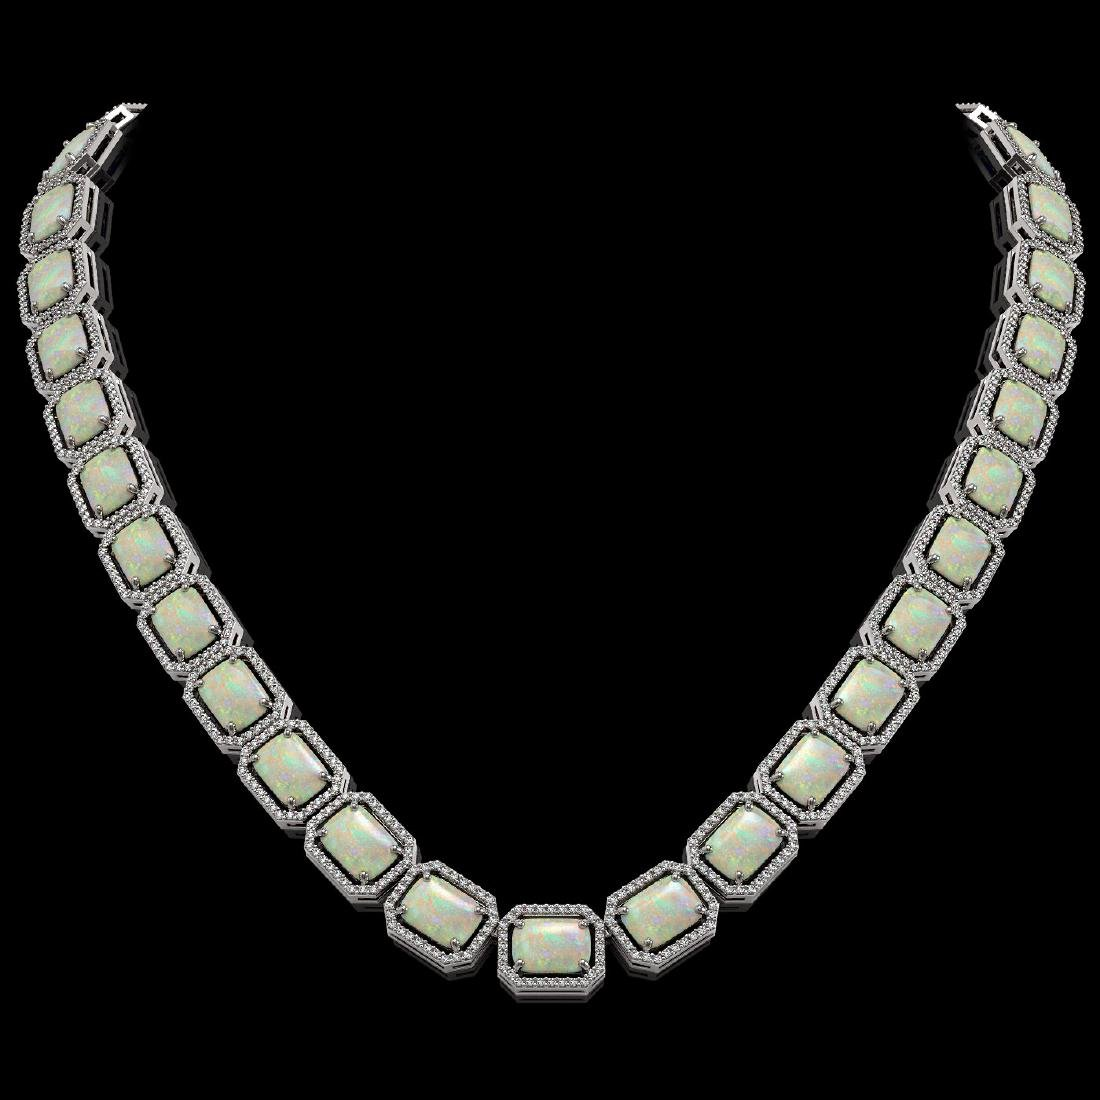 53.59 CTW Opal & Diamond Halo Necklace 10K White Gold